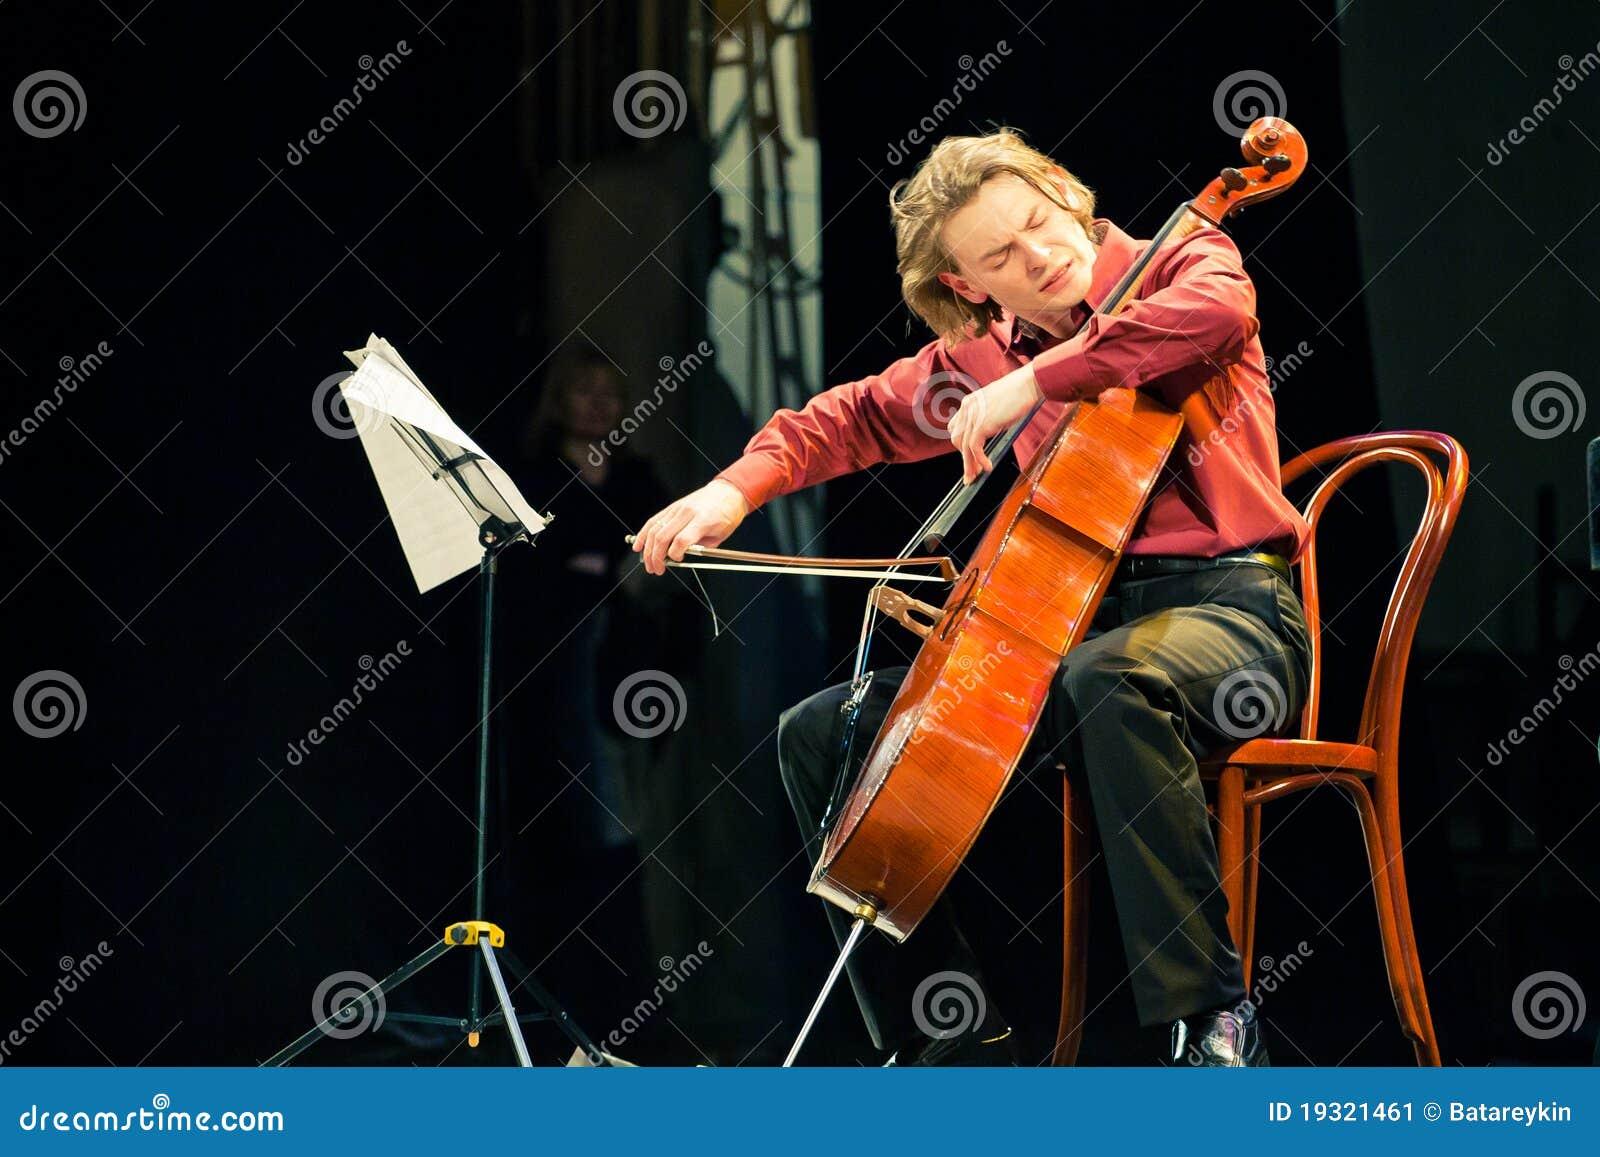 Duo de Beethoven - Fedor Elesin et Alina Kabanova